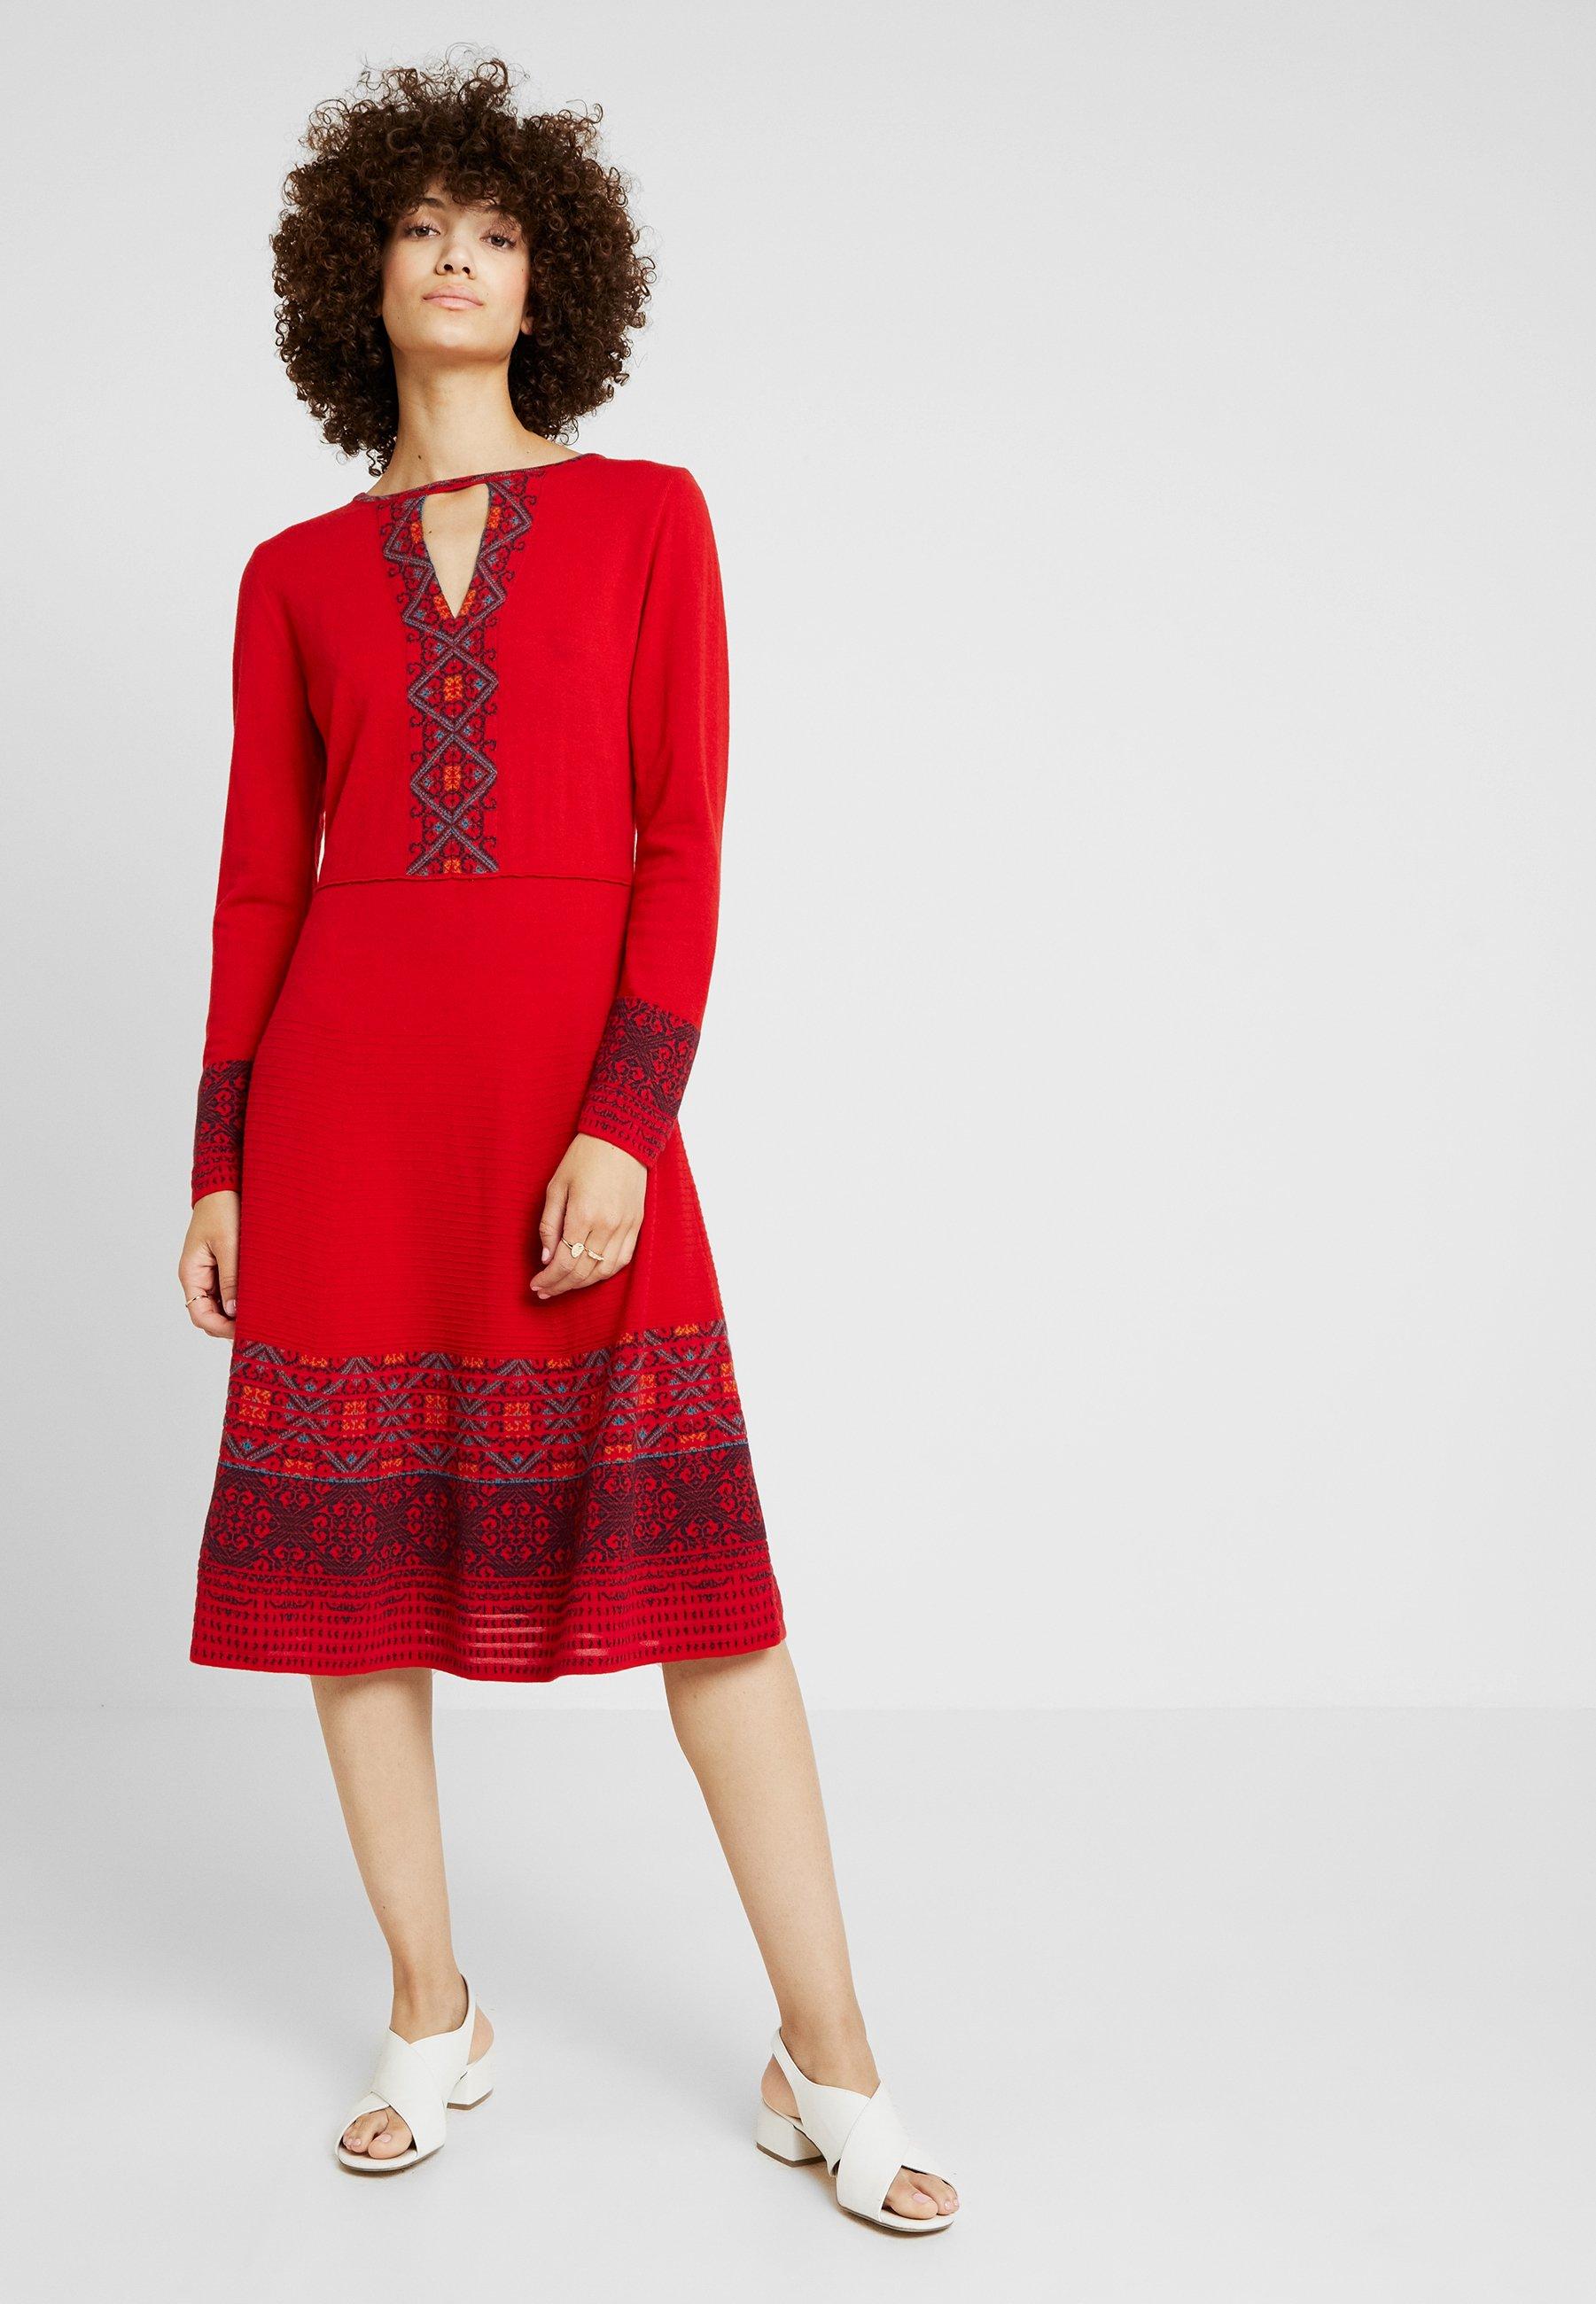 Maglia In Intarsia Dress Red Ivko PatternAbito N8O0wnvm